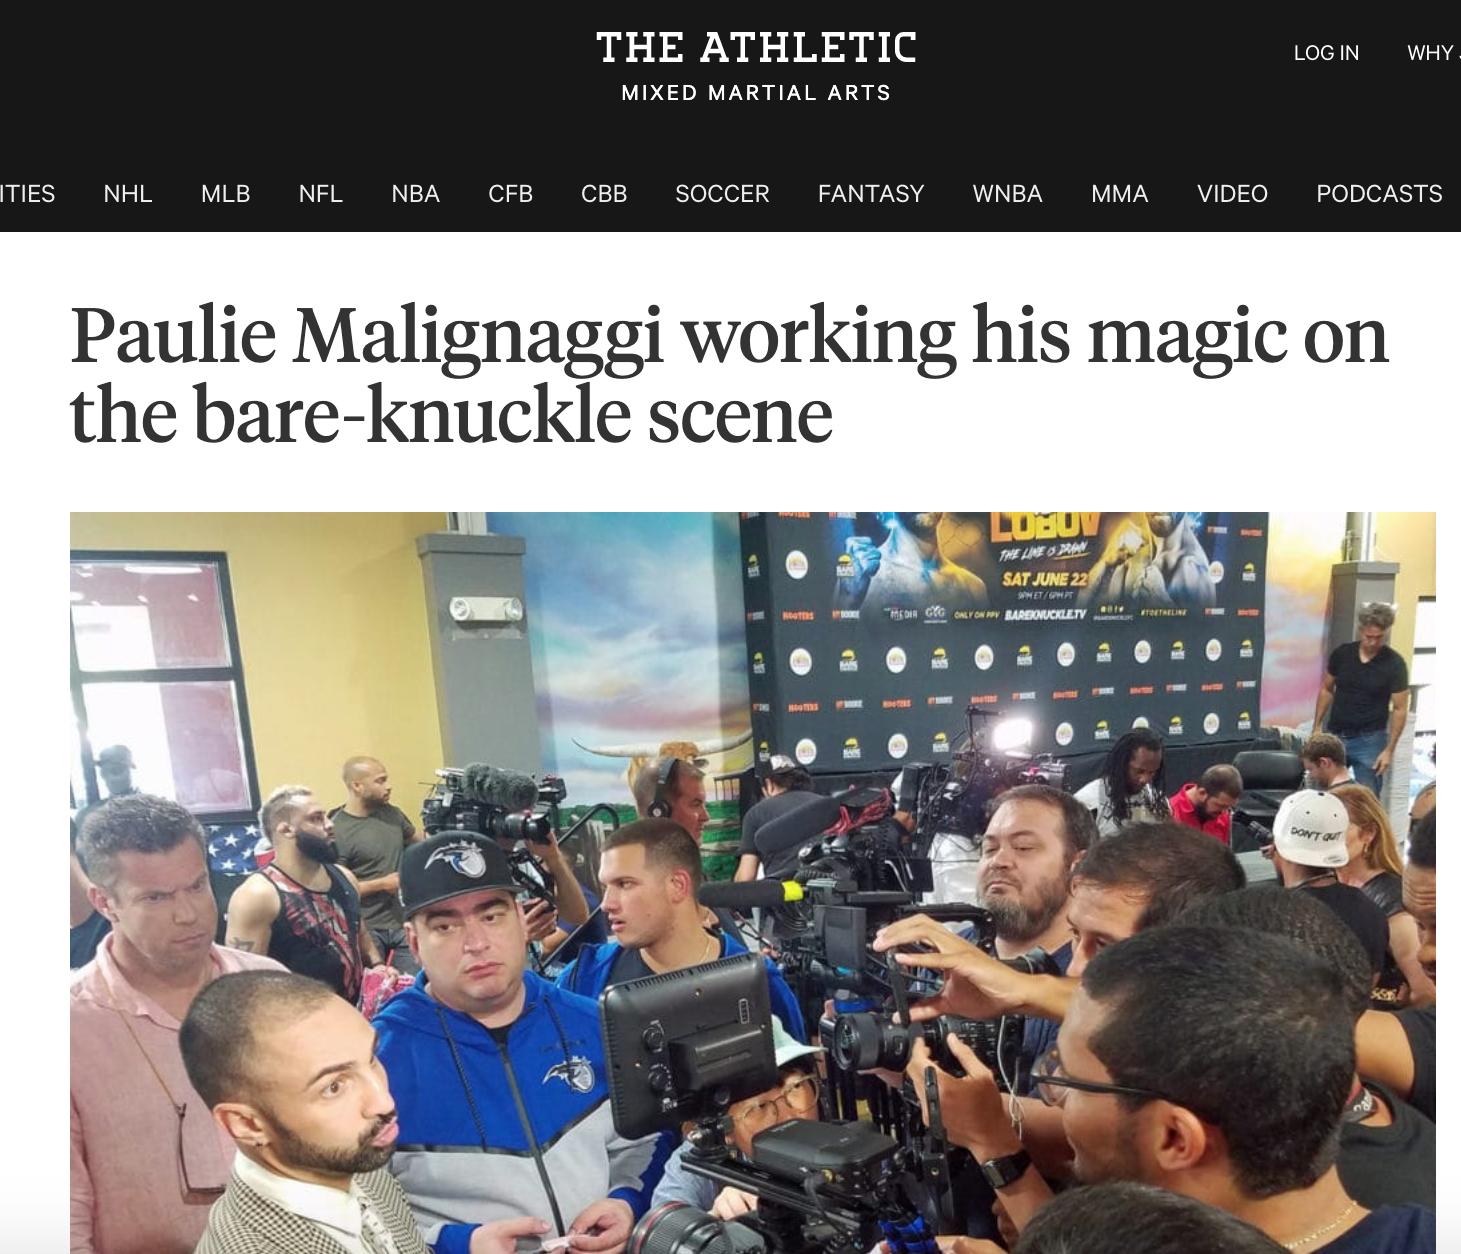 PAULIE MALIGNAGGI WORKING THE SCENE AT BKCF 6 IN FLORIDA